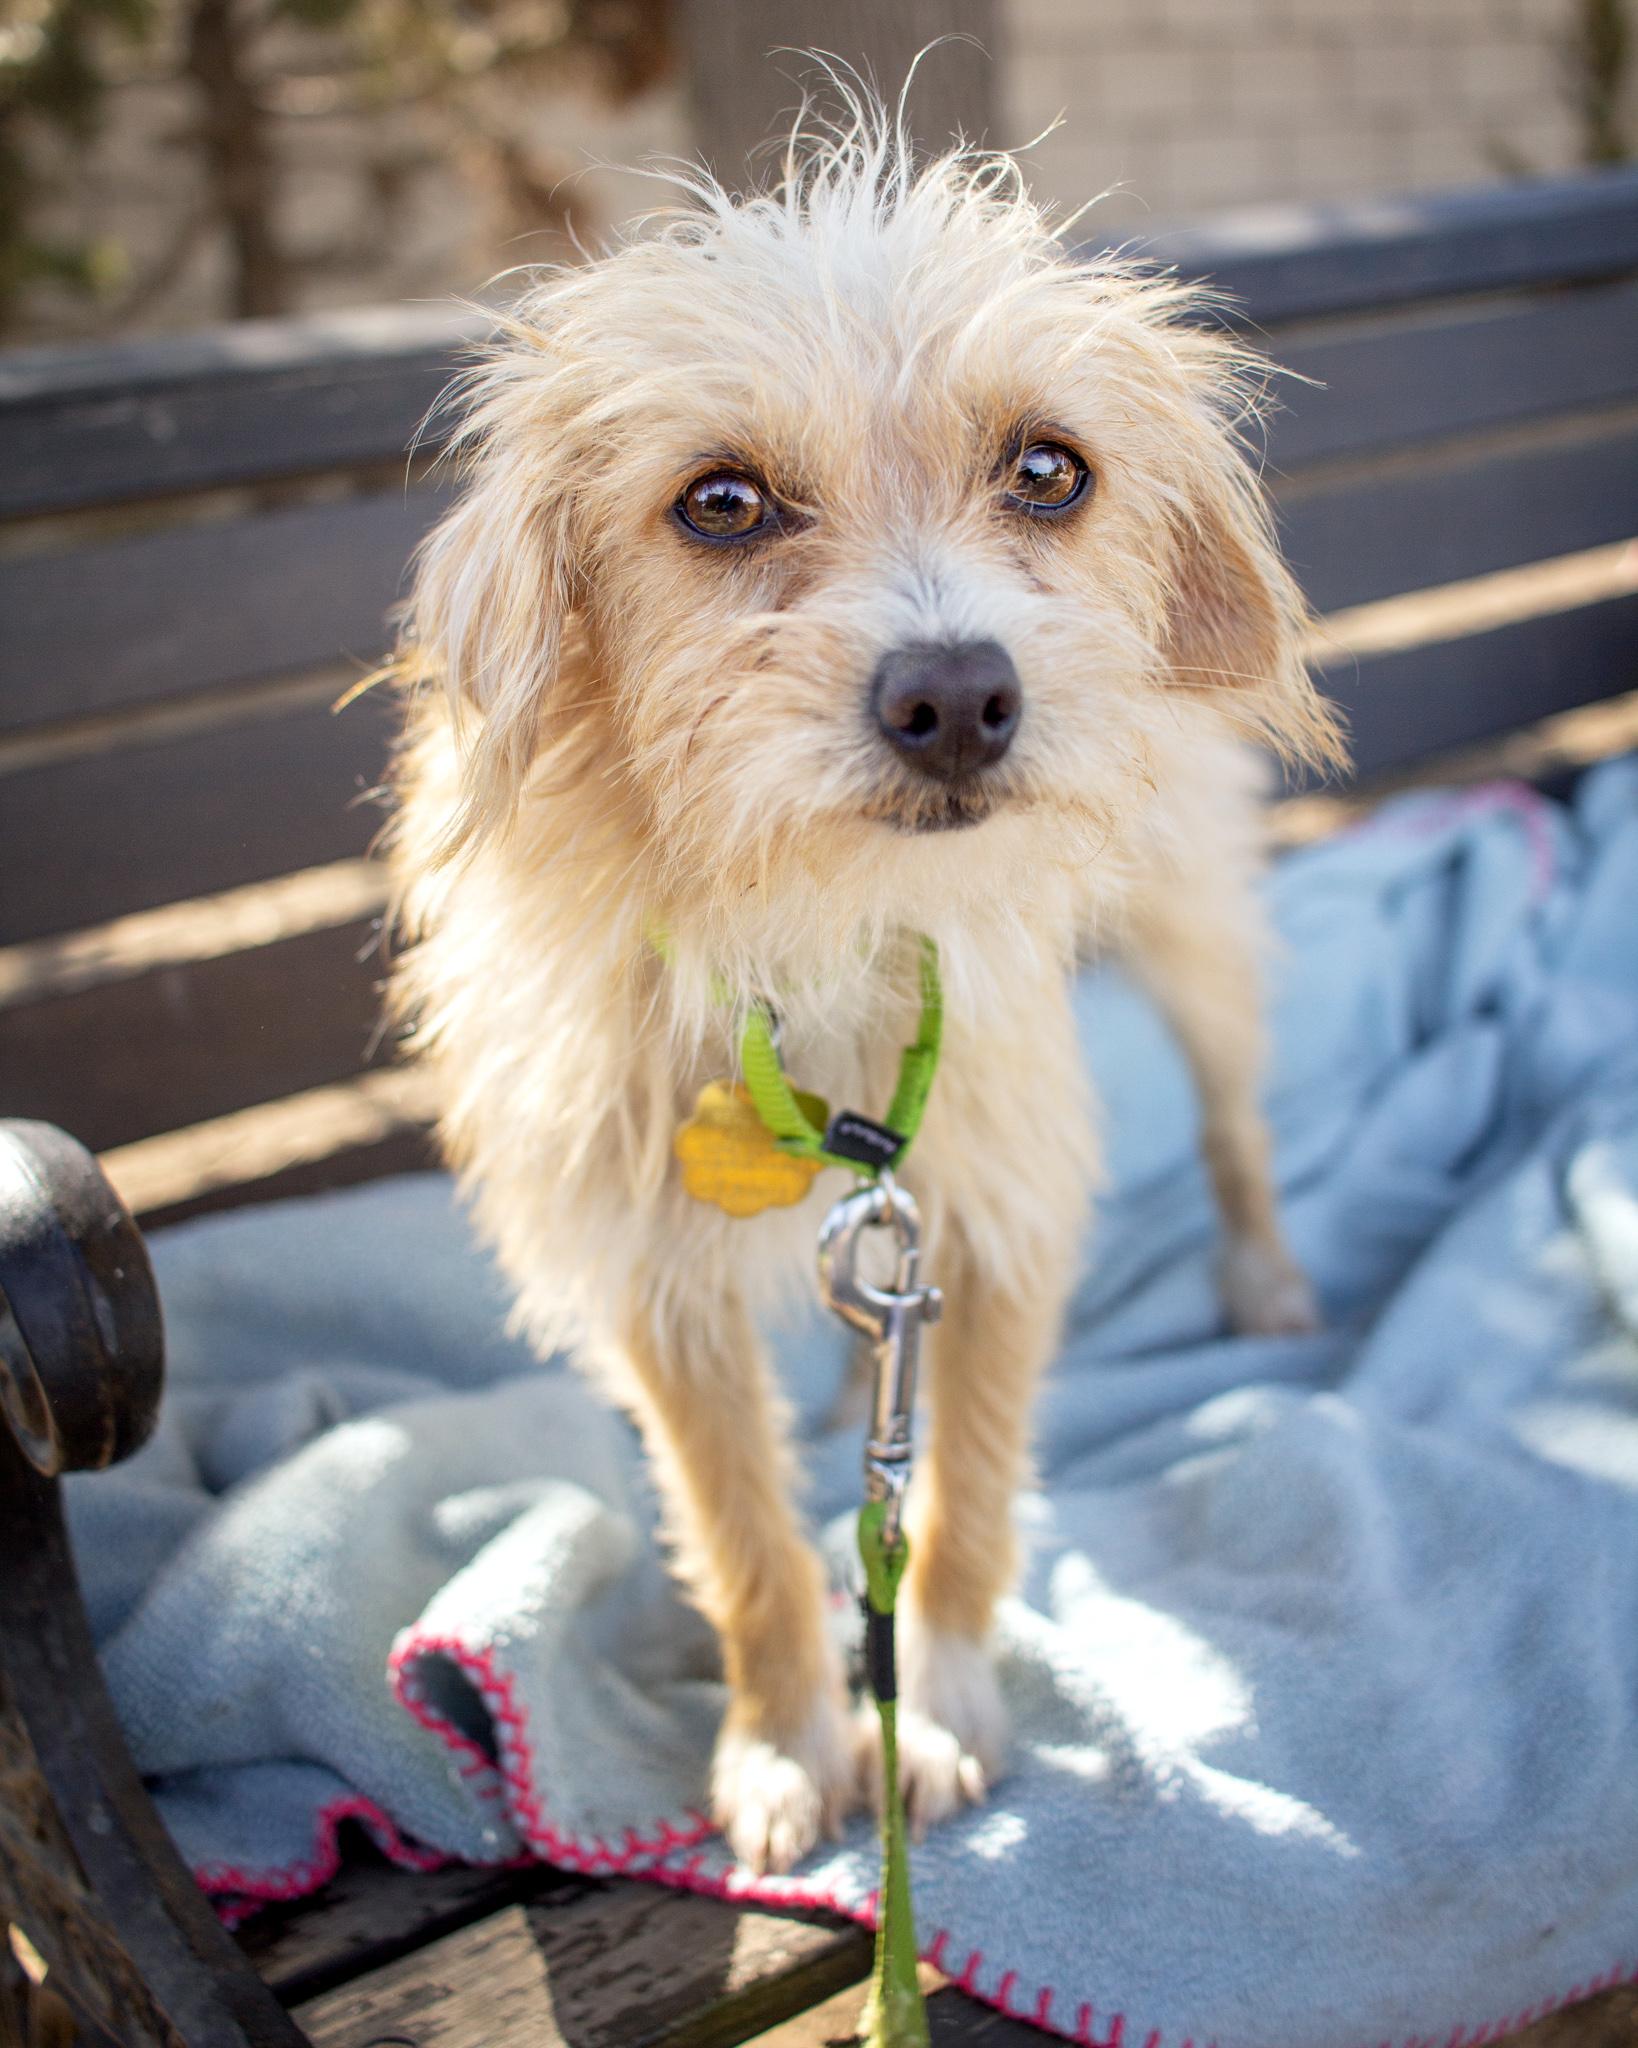 508-Orange-County-Dog-Photography-Steamer-Lee-Southern-California-SBACC.JPG